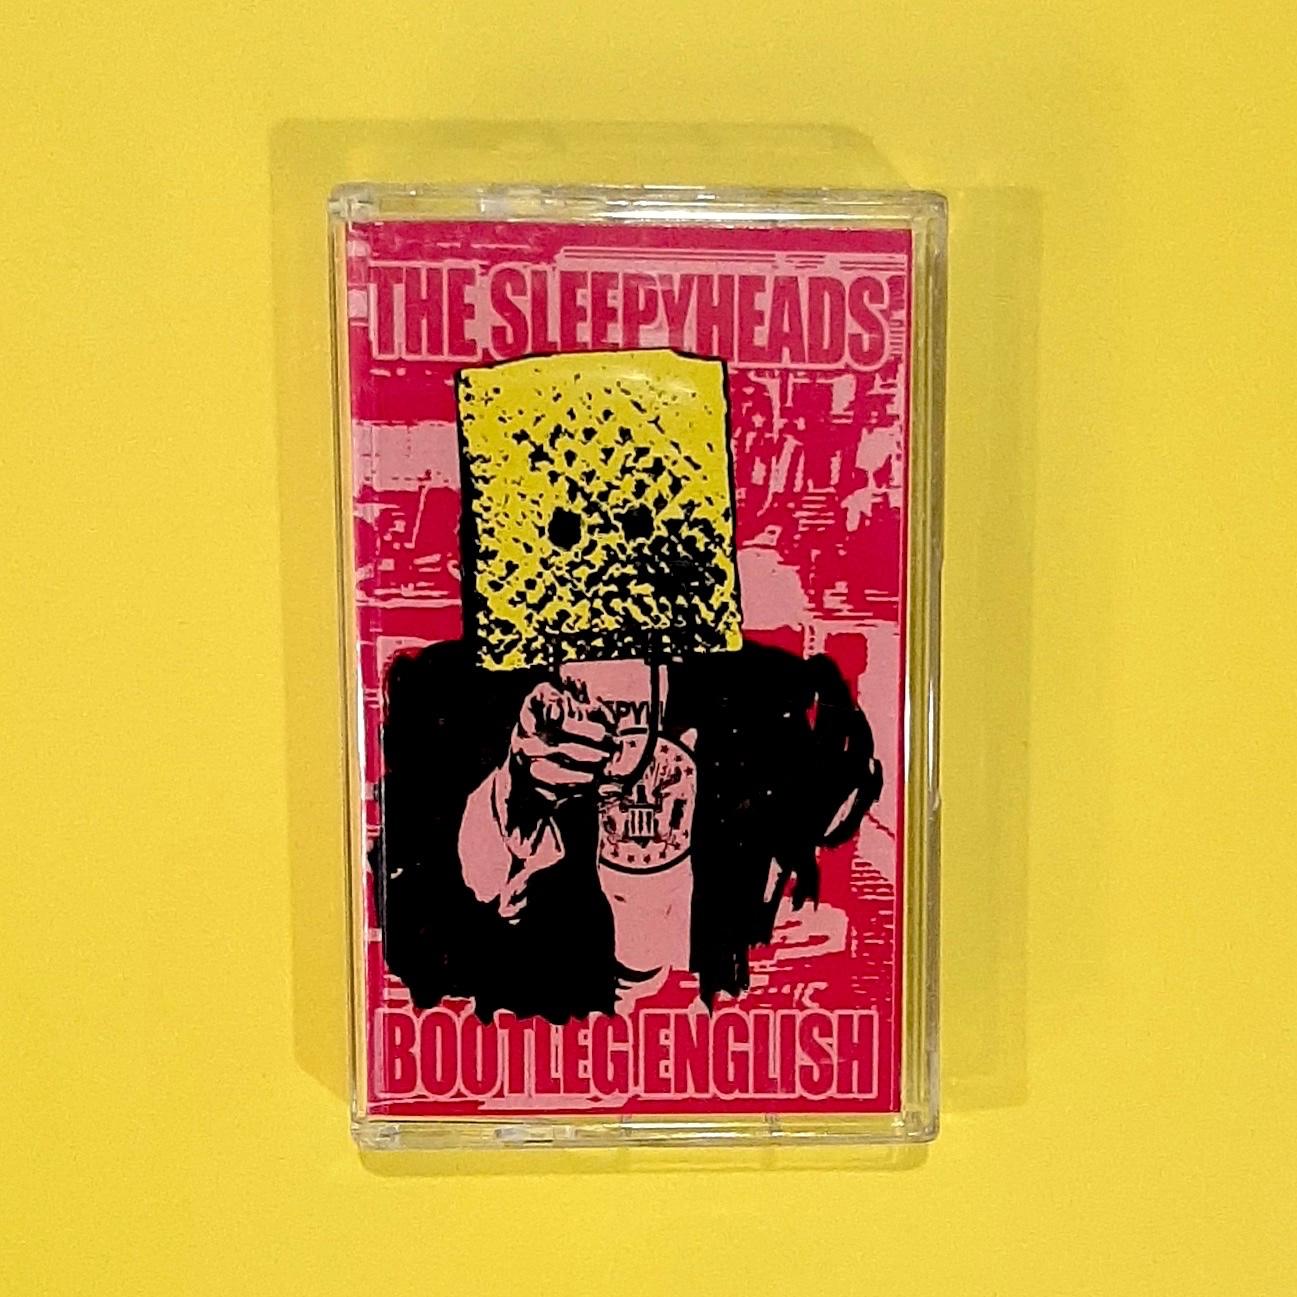 The Sleepyheads - Bootleg English (Middle Finger Records / Nine Iron)